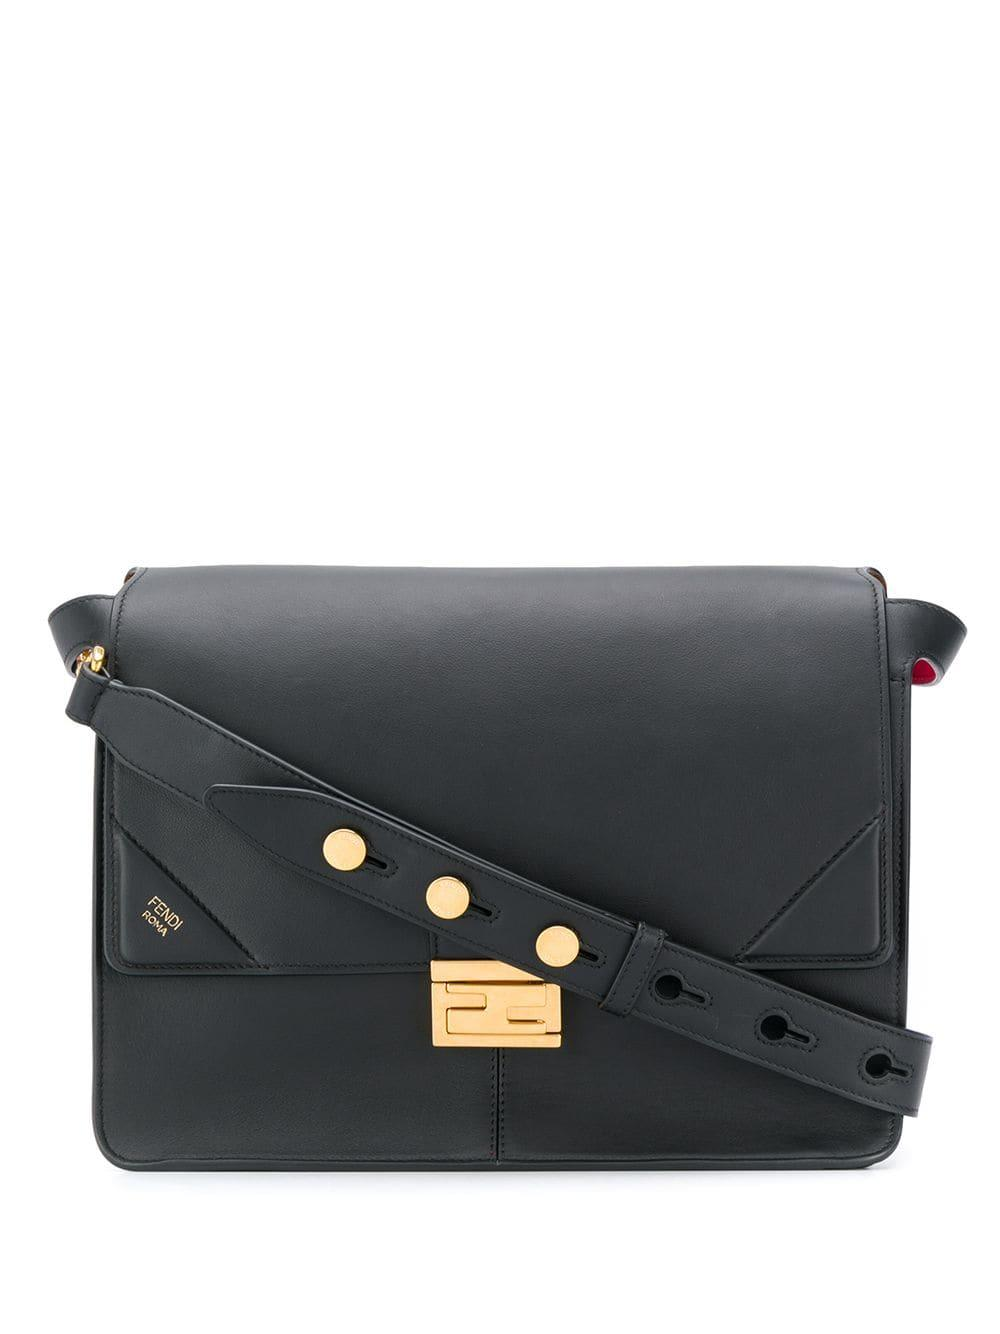 Kan U- Large Slouchy Bag Item # 8BT314-A5DYF15ZW